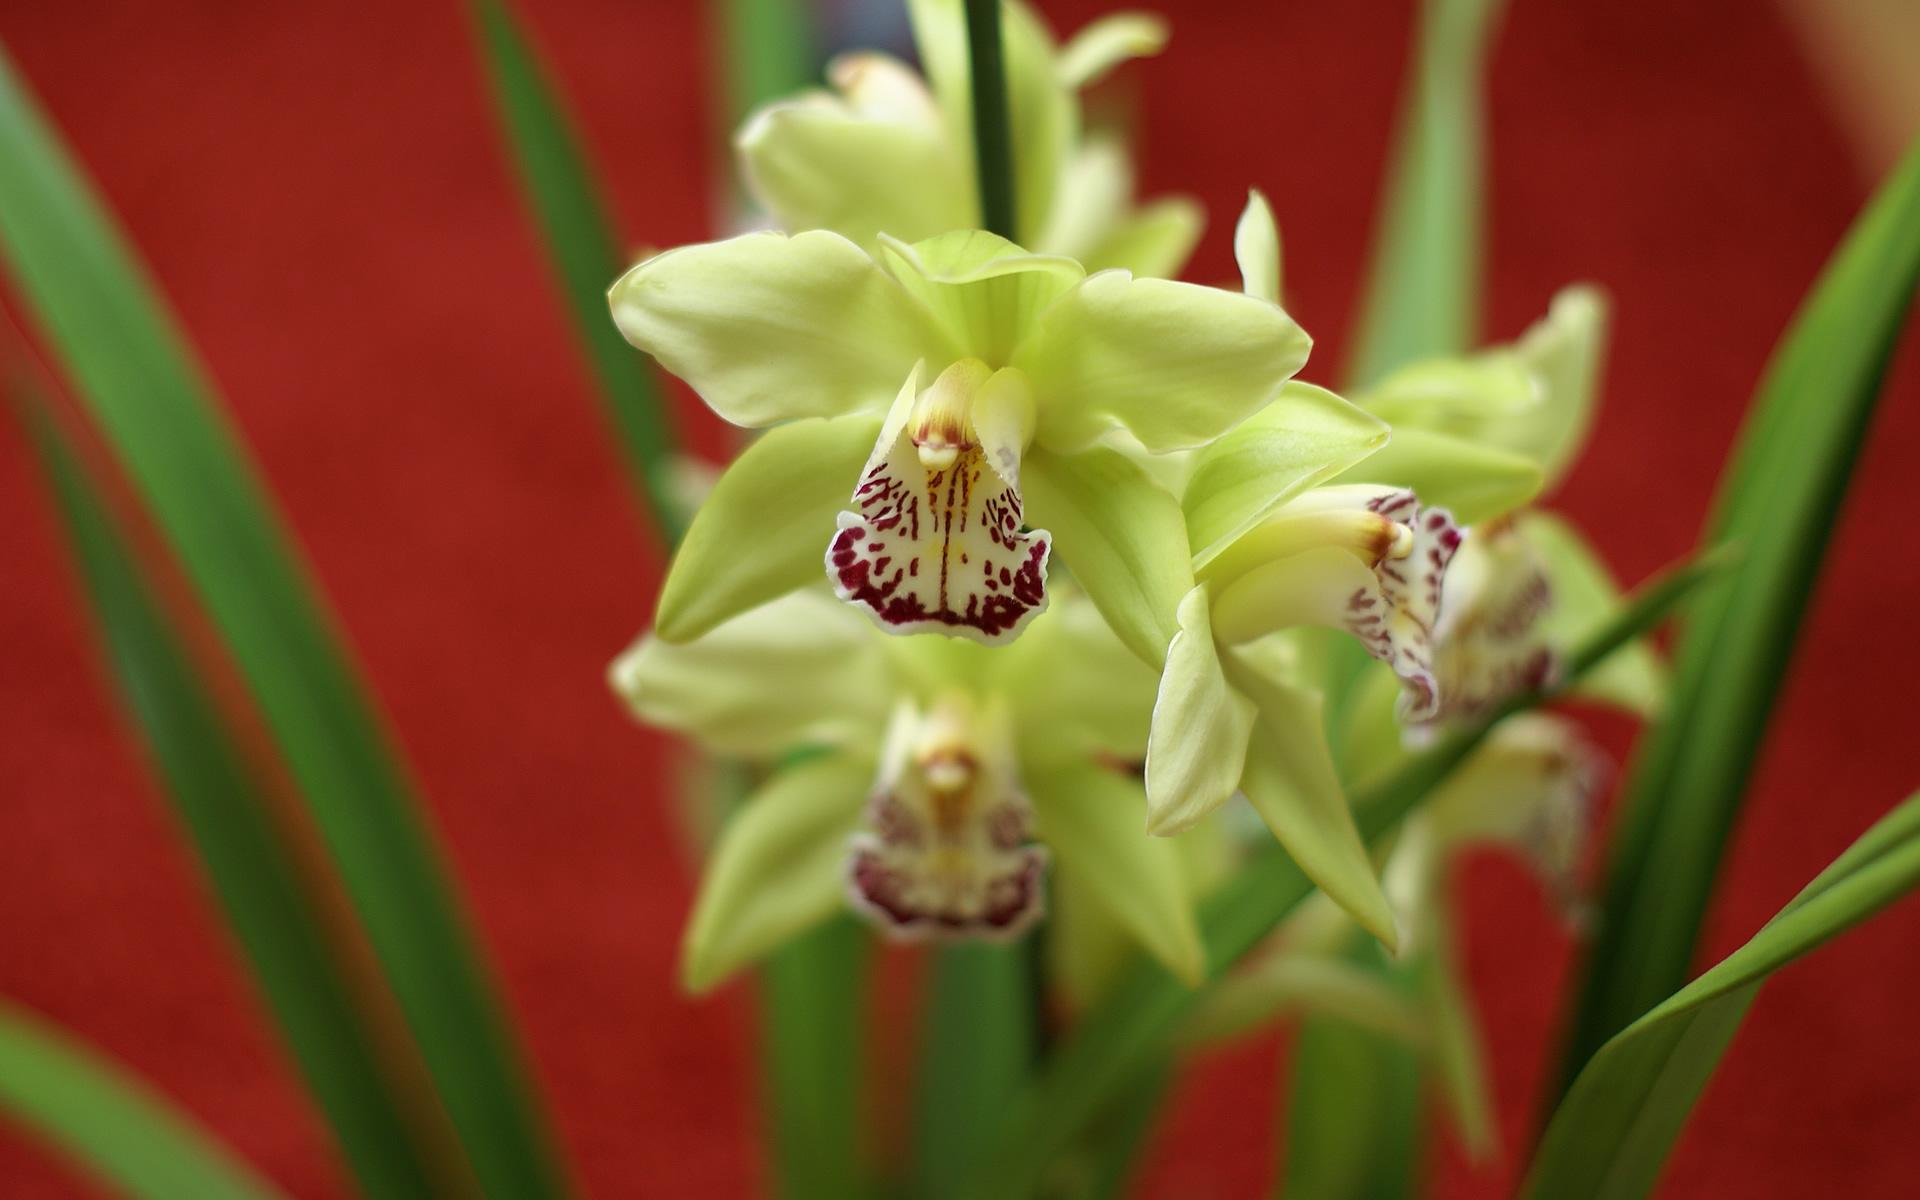 Shenzhen Nongke Orchid Full HD